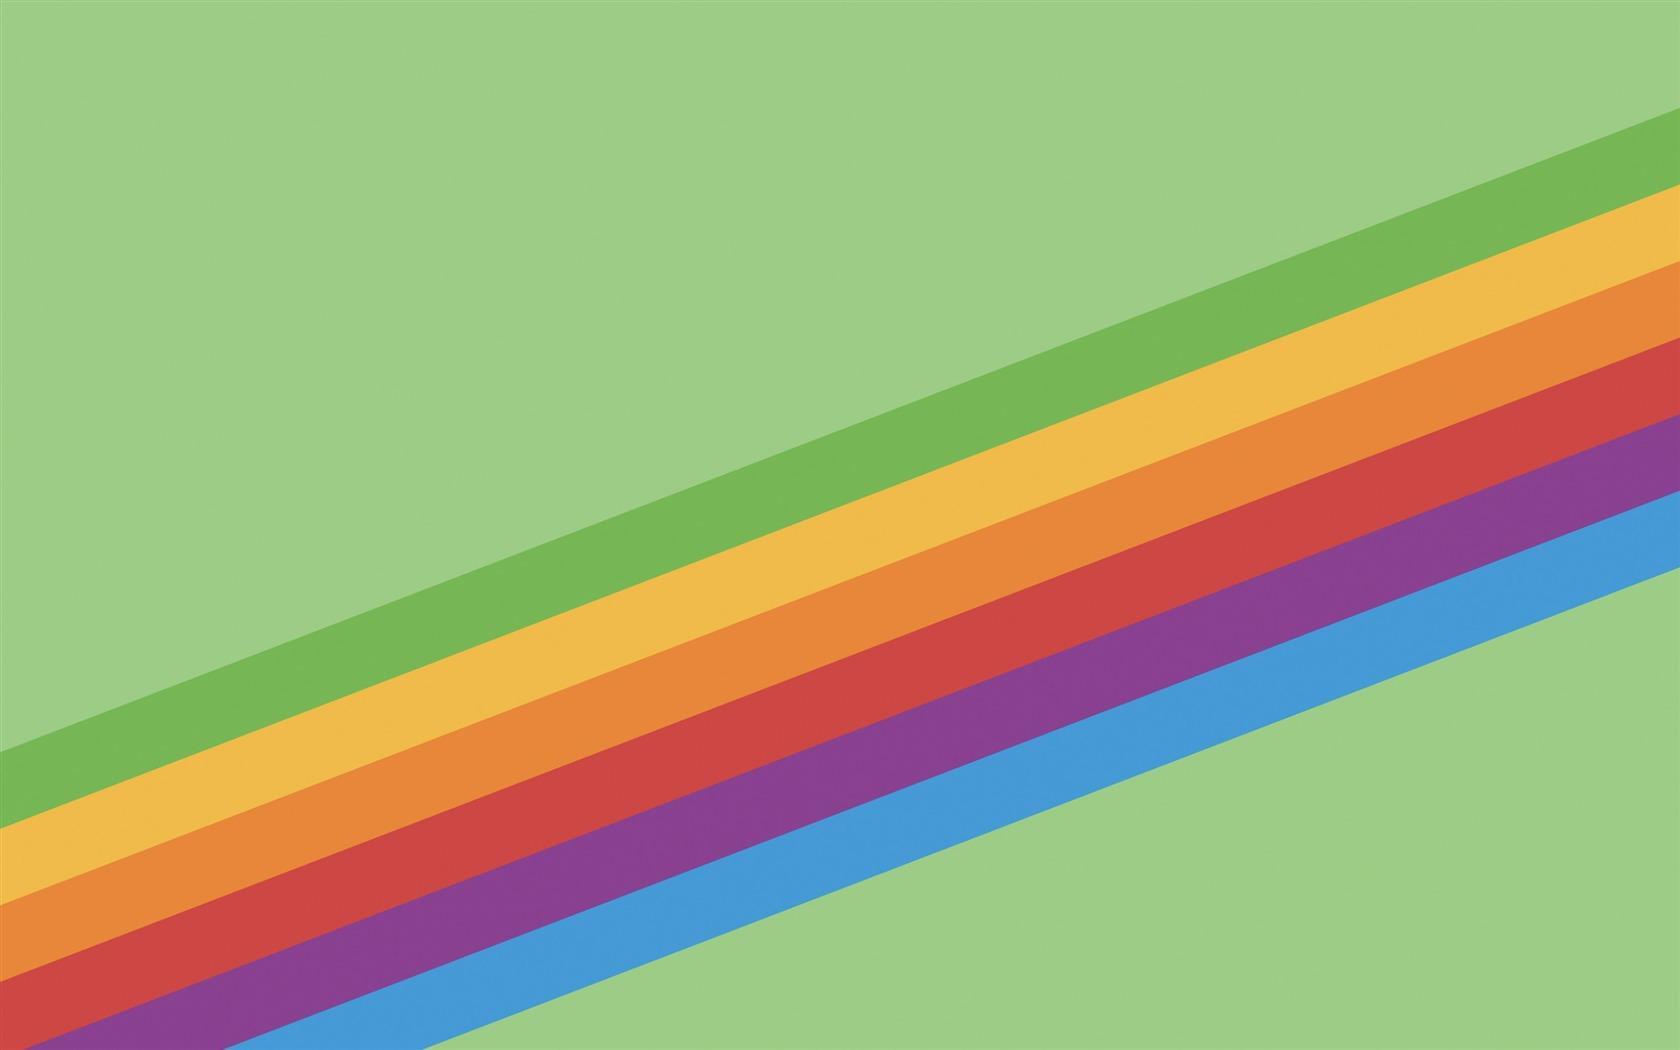 Rainbow Retina Apple Ios 11 Iphone 8 Iphone X Hd Wallpapers Preview 10wallpaper Com